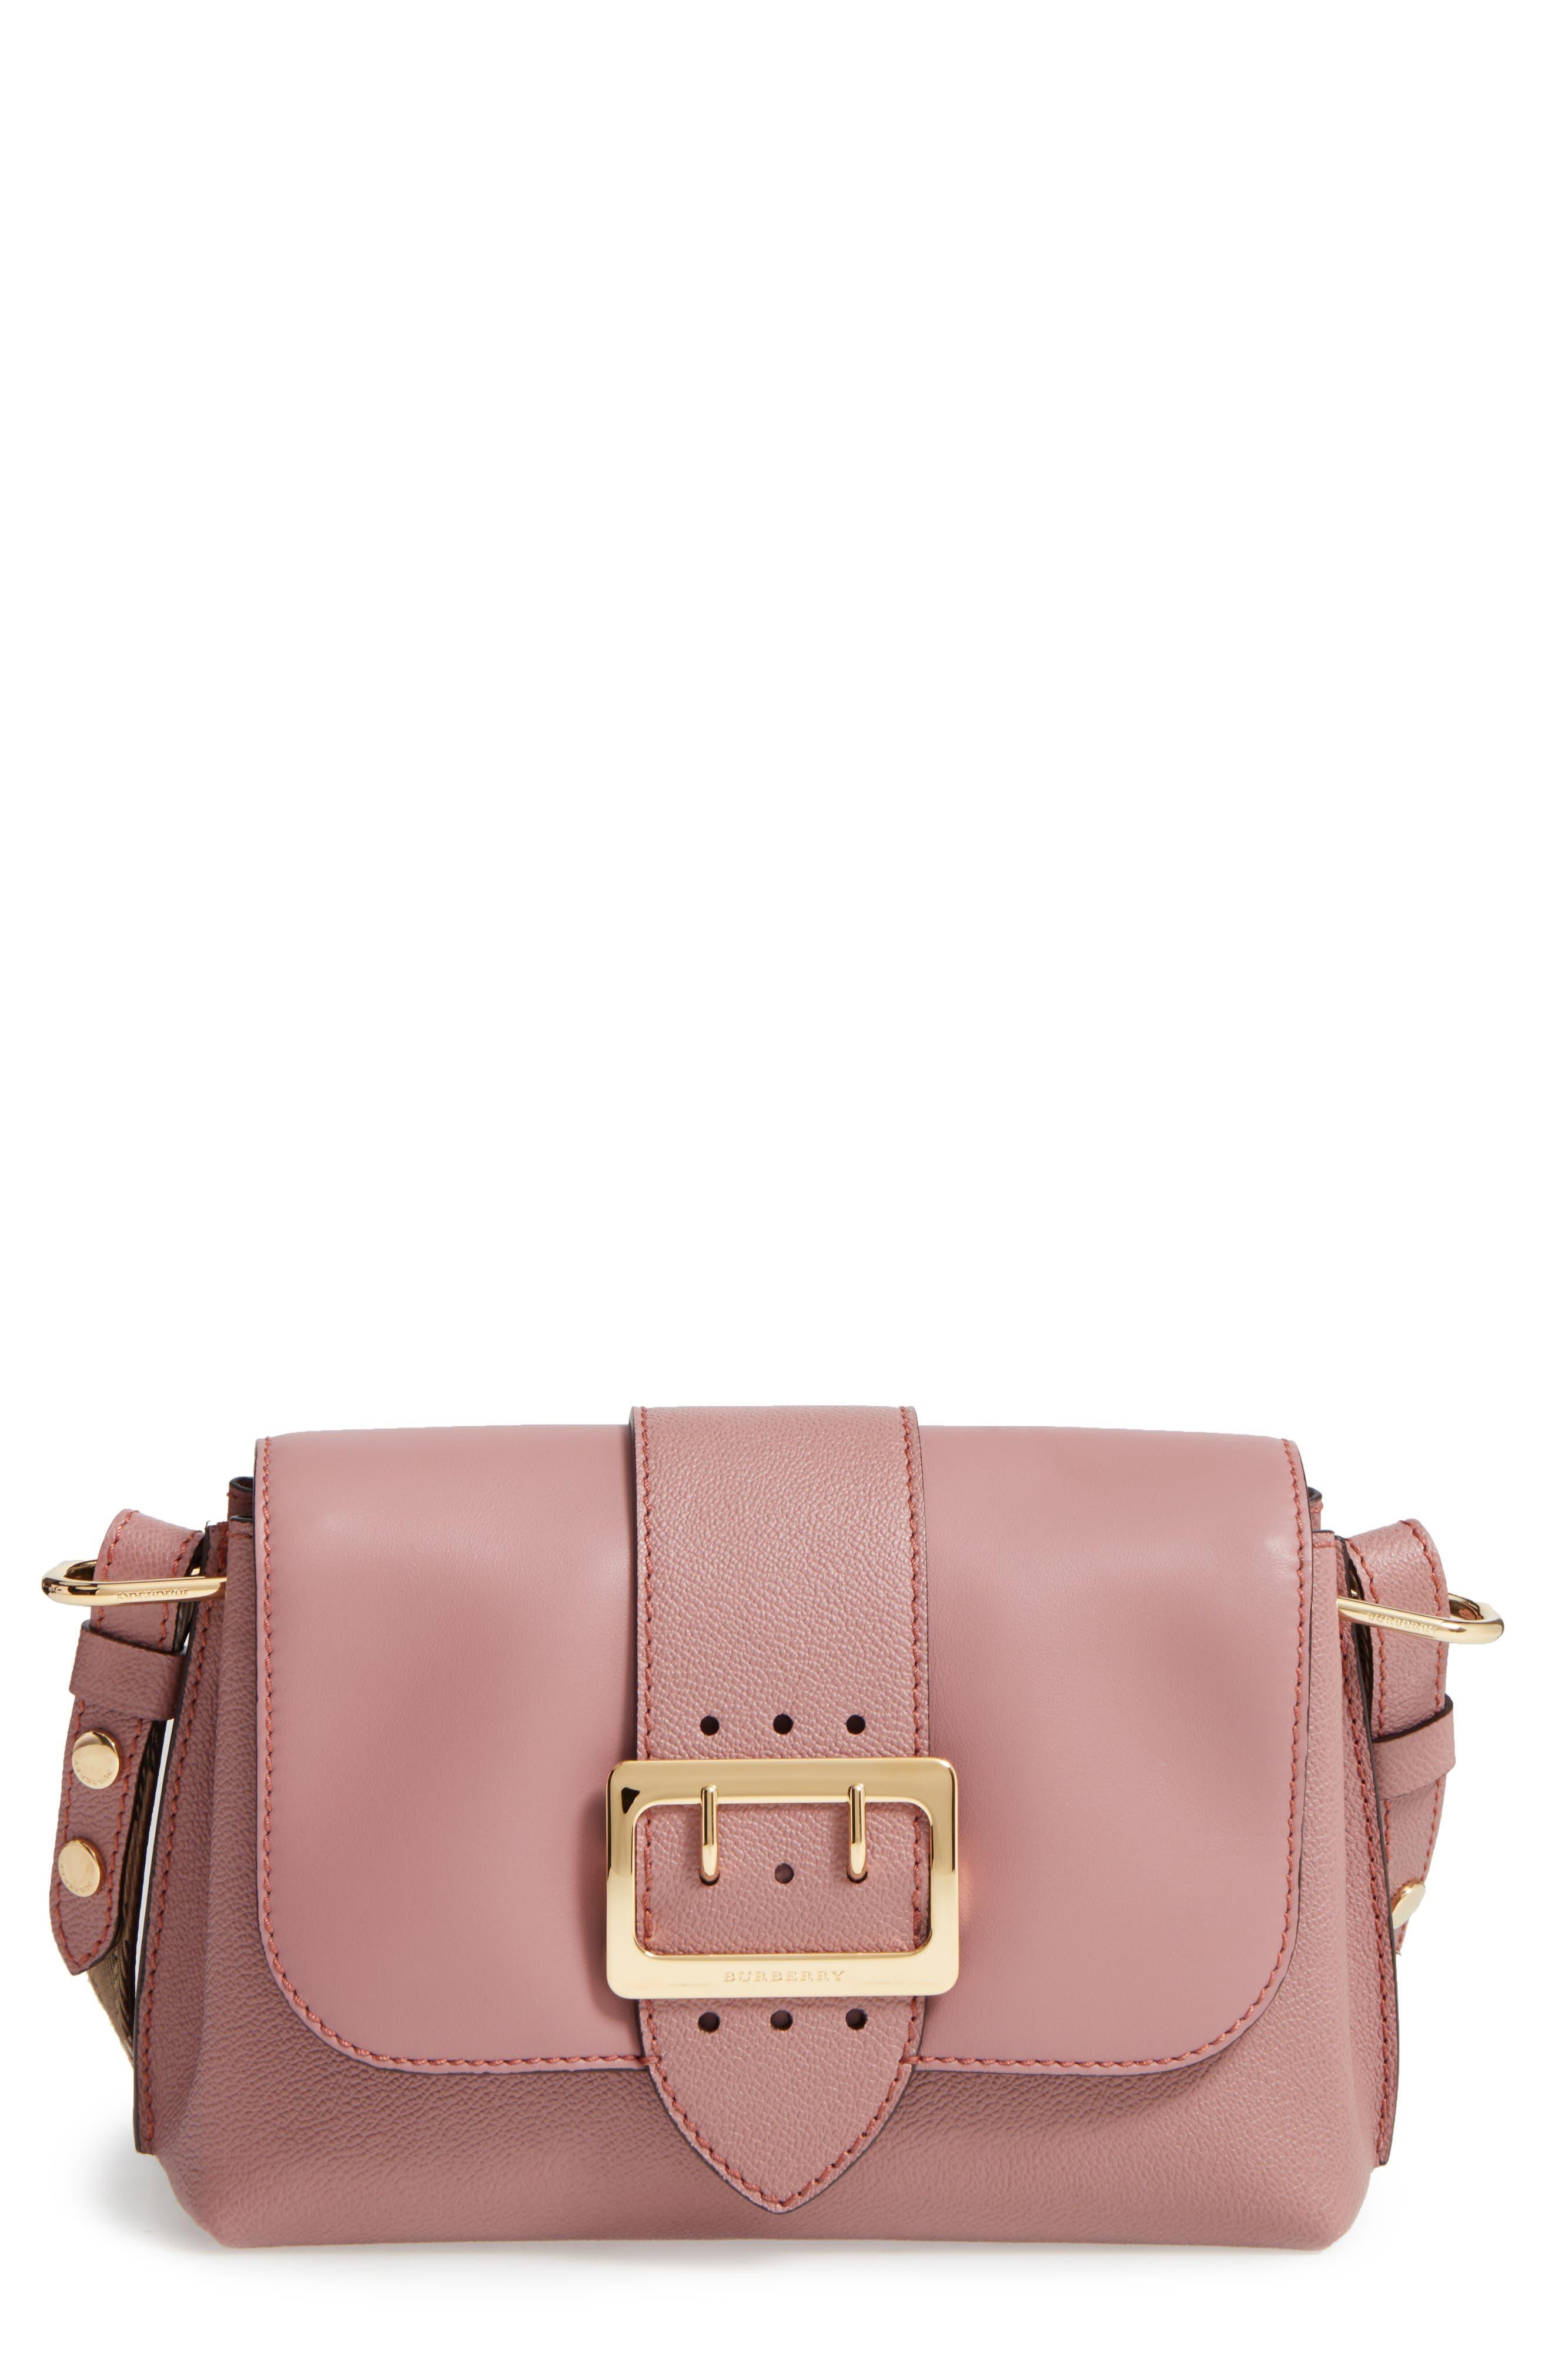 Burberry Small Medley Leather Shoulder Bag